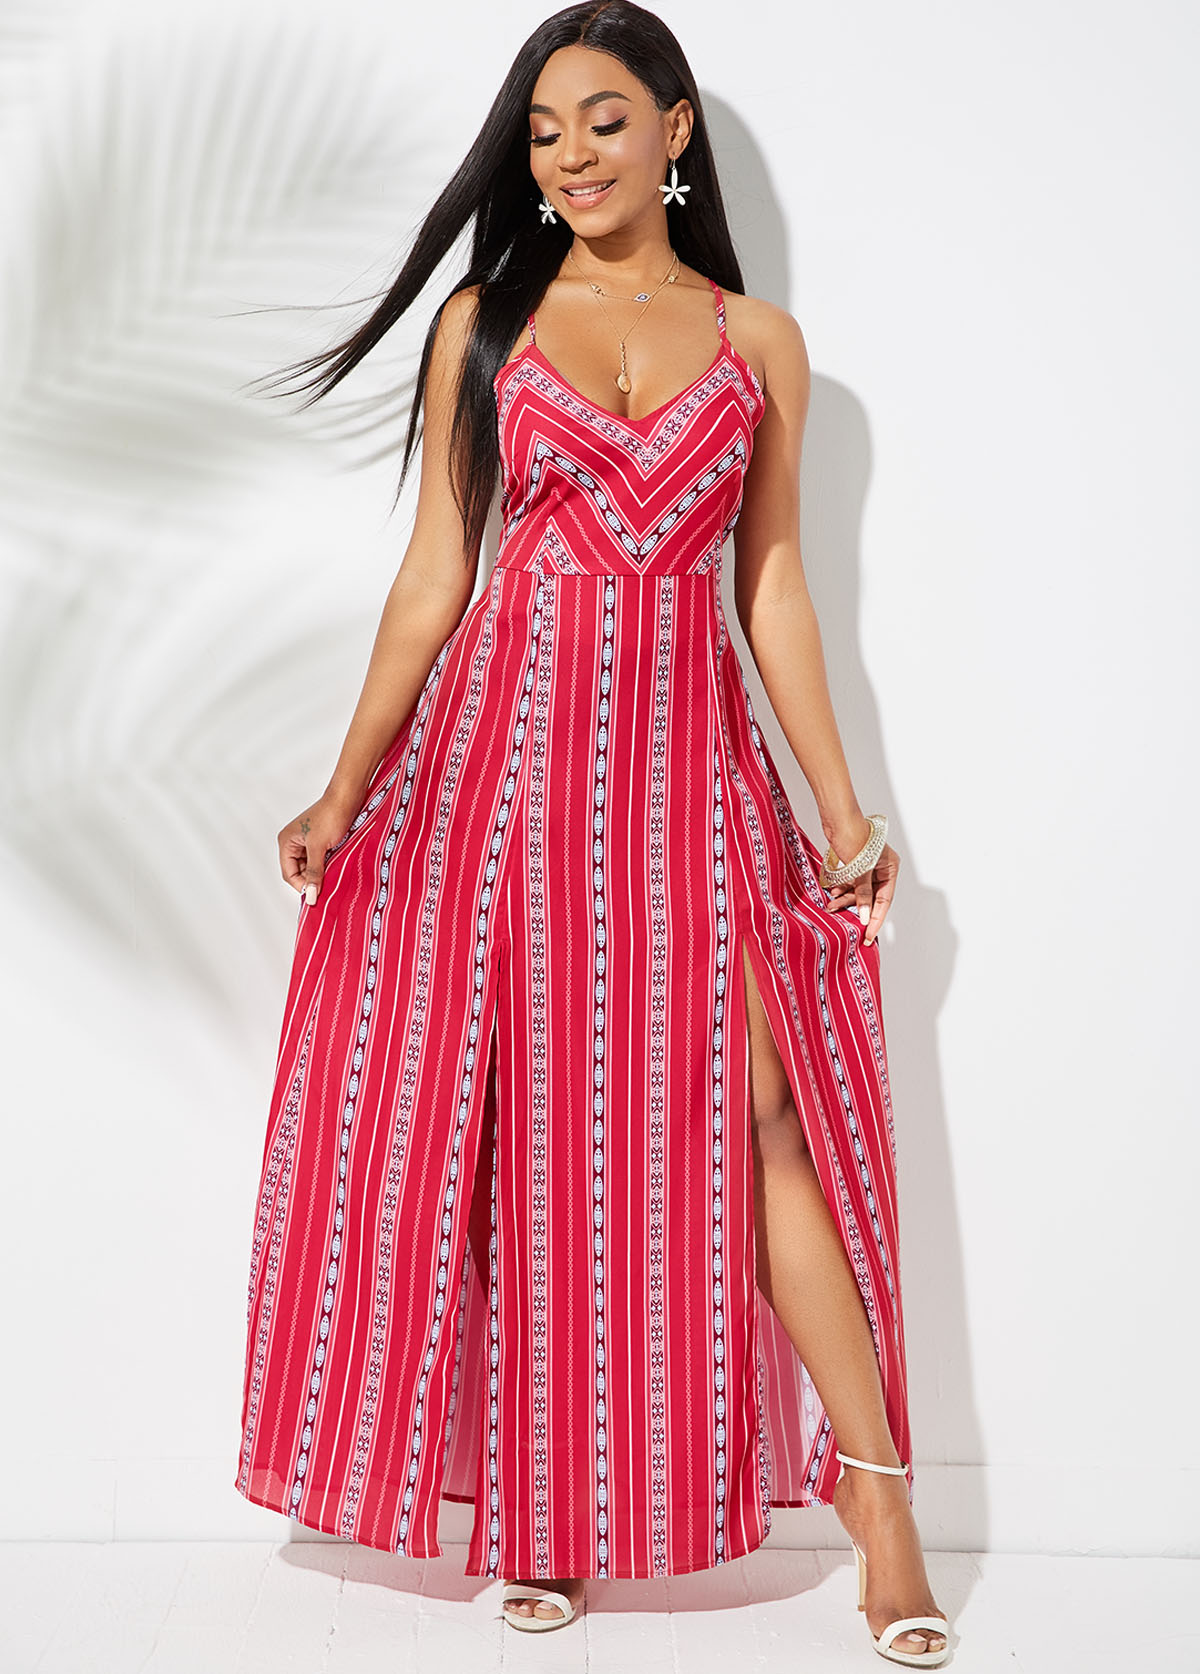 ROTITA Side Slit Tie Back Spaghetti Strap Dress